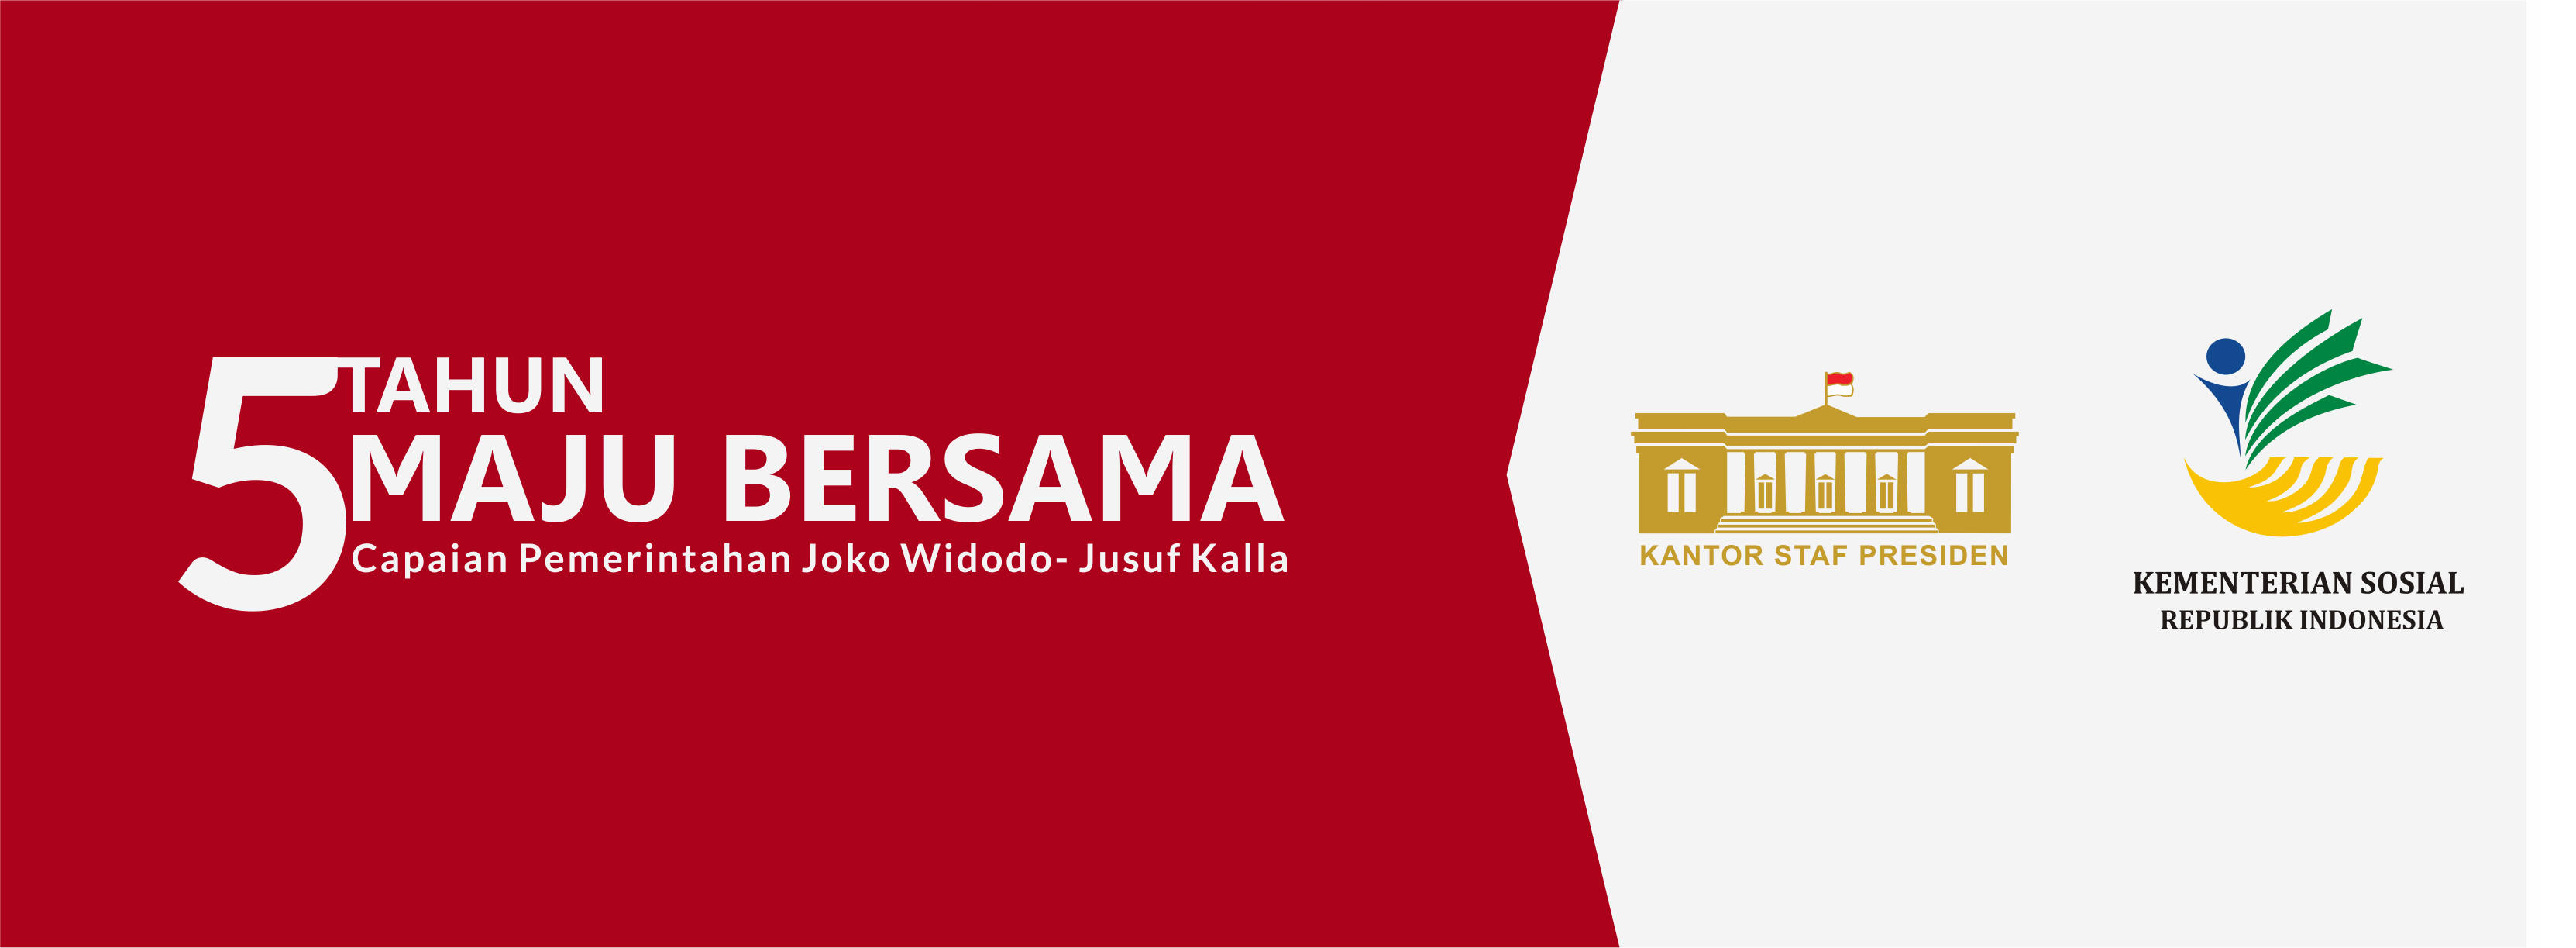 Laporan  5 Tahun Capaian Pemerintahan Joko Widodo - Jusuf Kalla